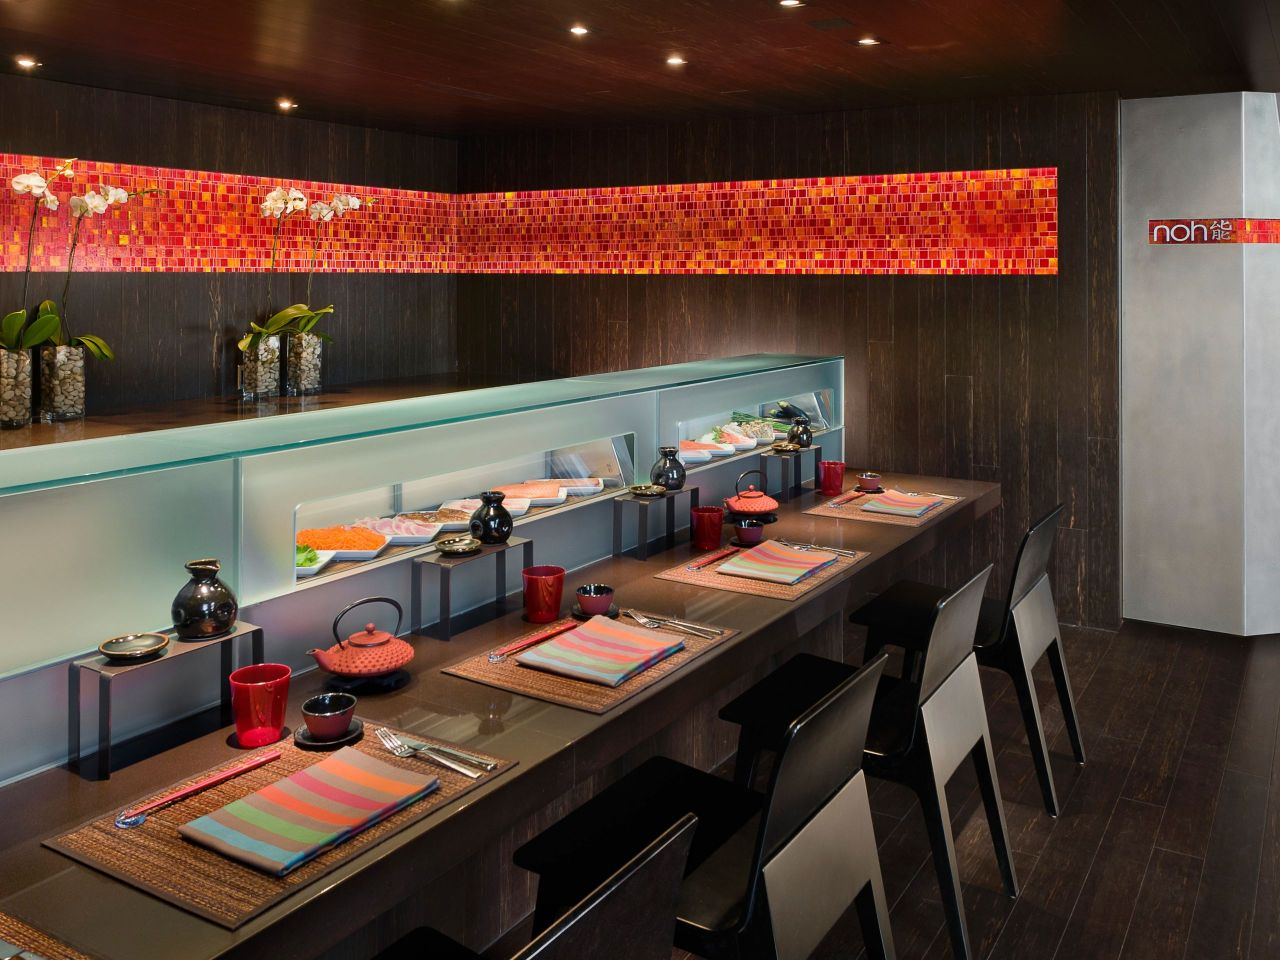 Noh Restaurant